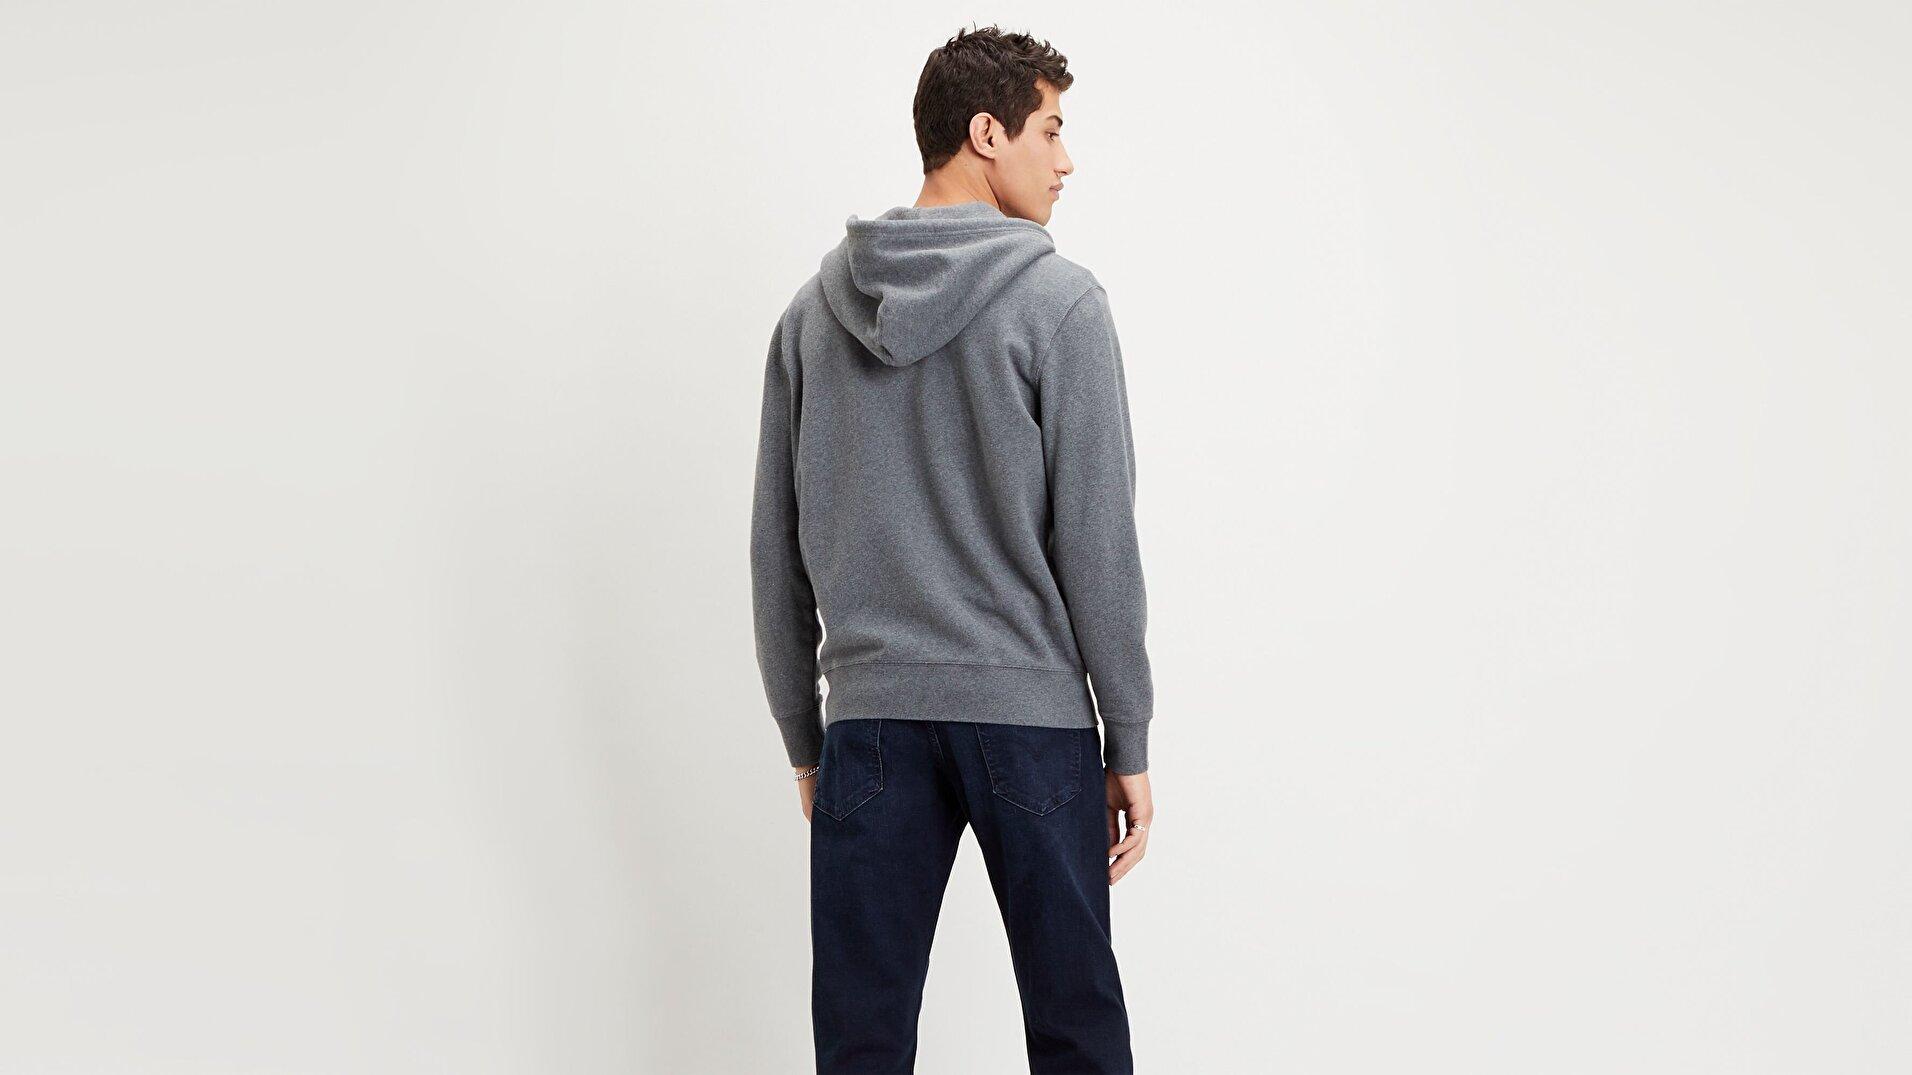 New Original Zip Up Charcoal Heather Gri Erkek Kapüşonlu Sweatshirt